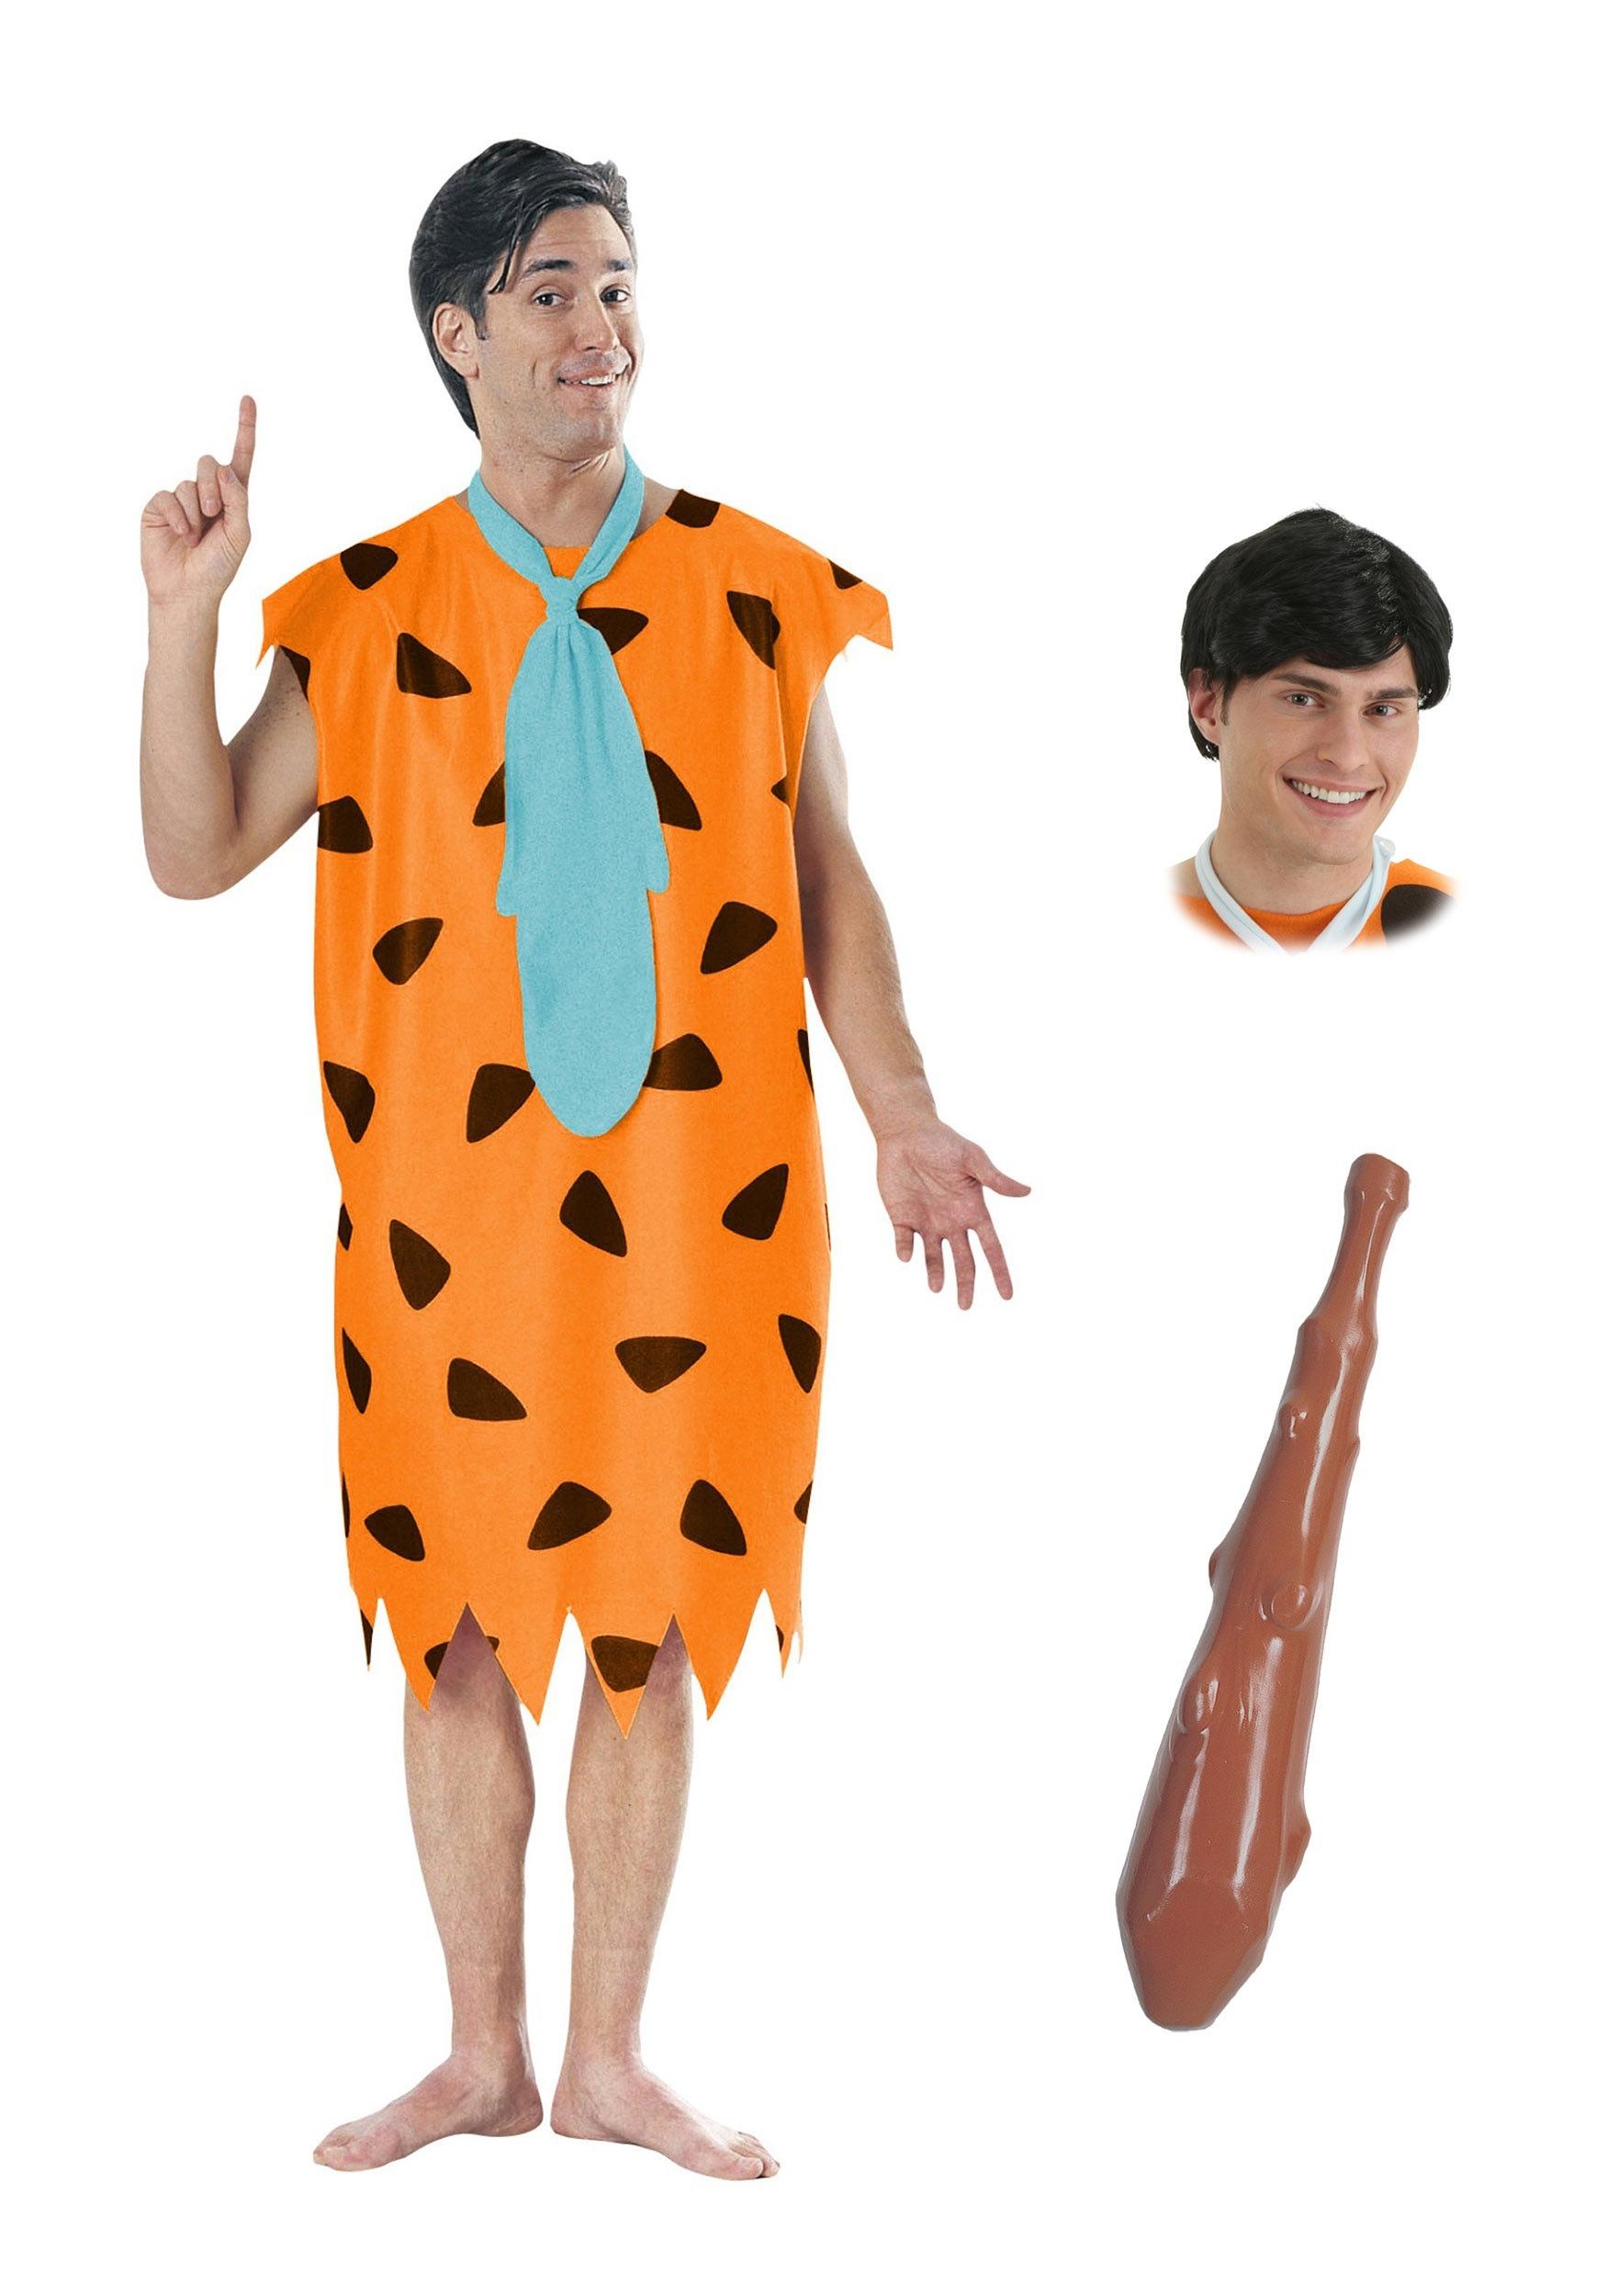 Adult fred flintstone costume package for men mens fred flintstone costume package solutioingenieria Gallery